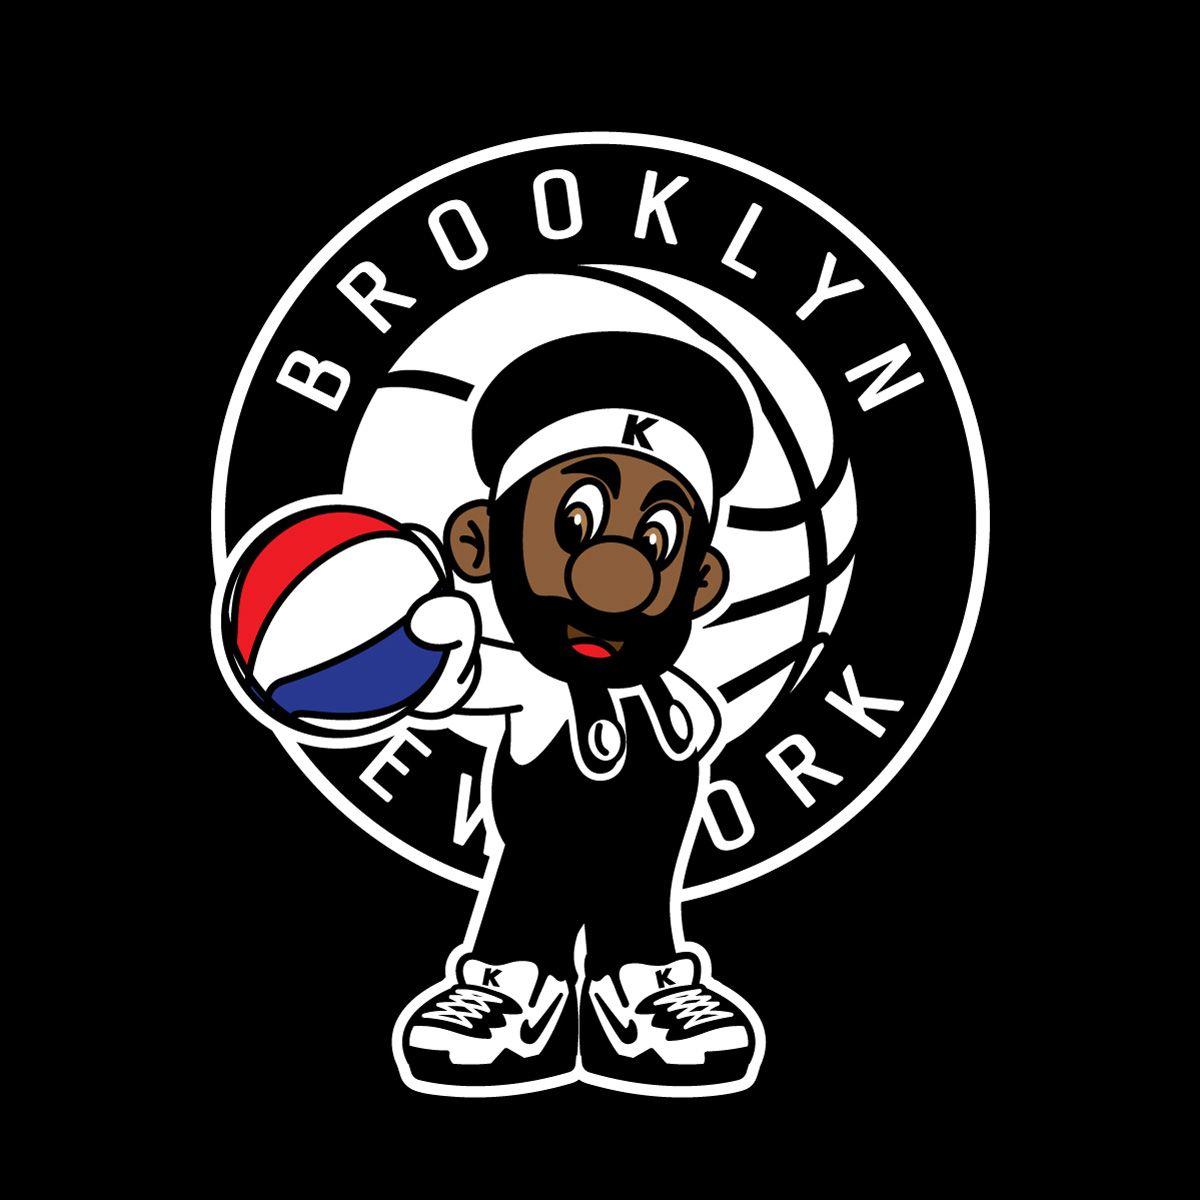 Kevin Durant Brooklyn Nets Biggie Coogi Basketball NBA